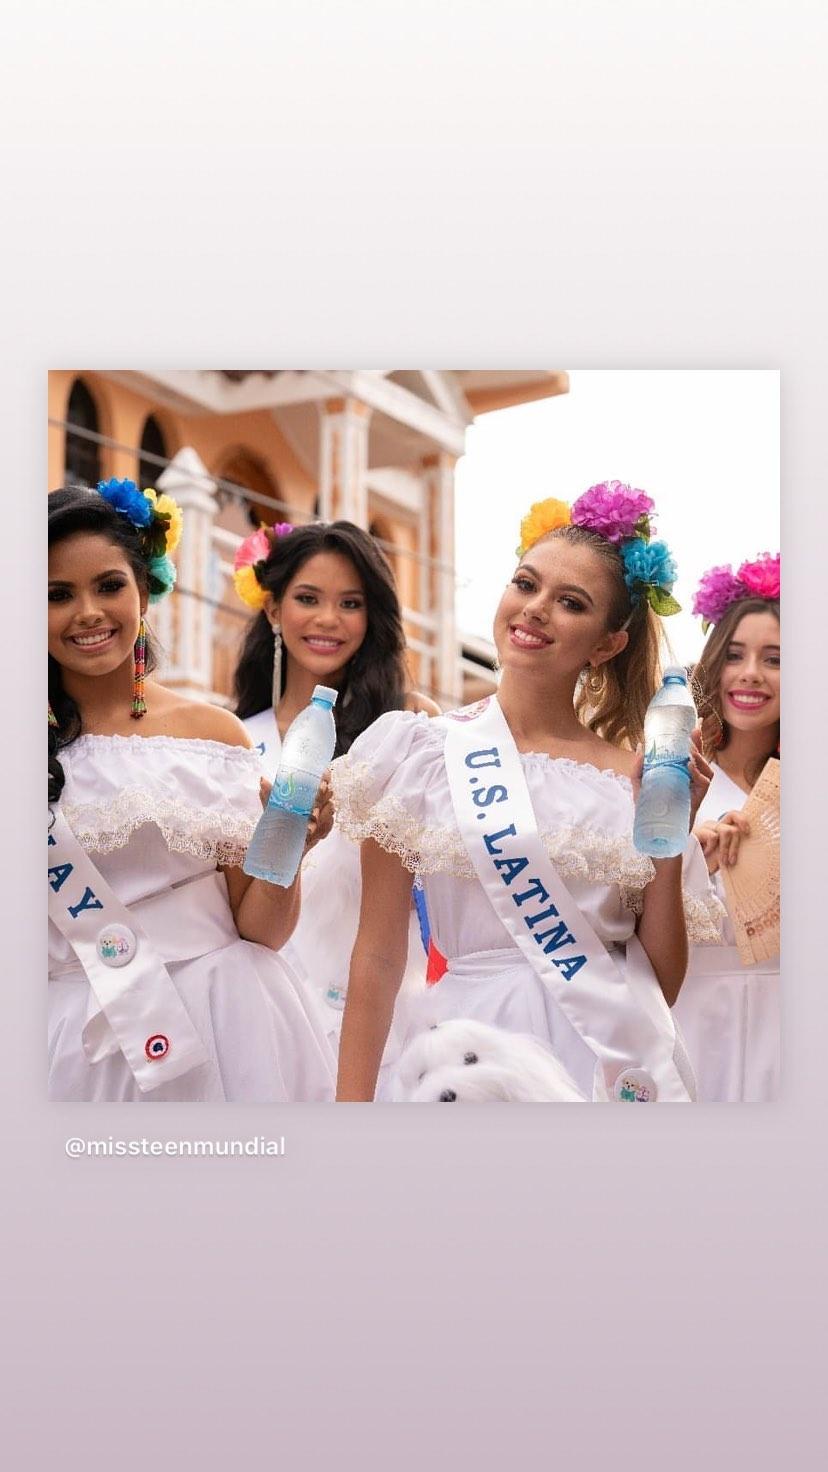 estefany frost, miss teen mundial latina usa 2019. - Página 4 59782210